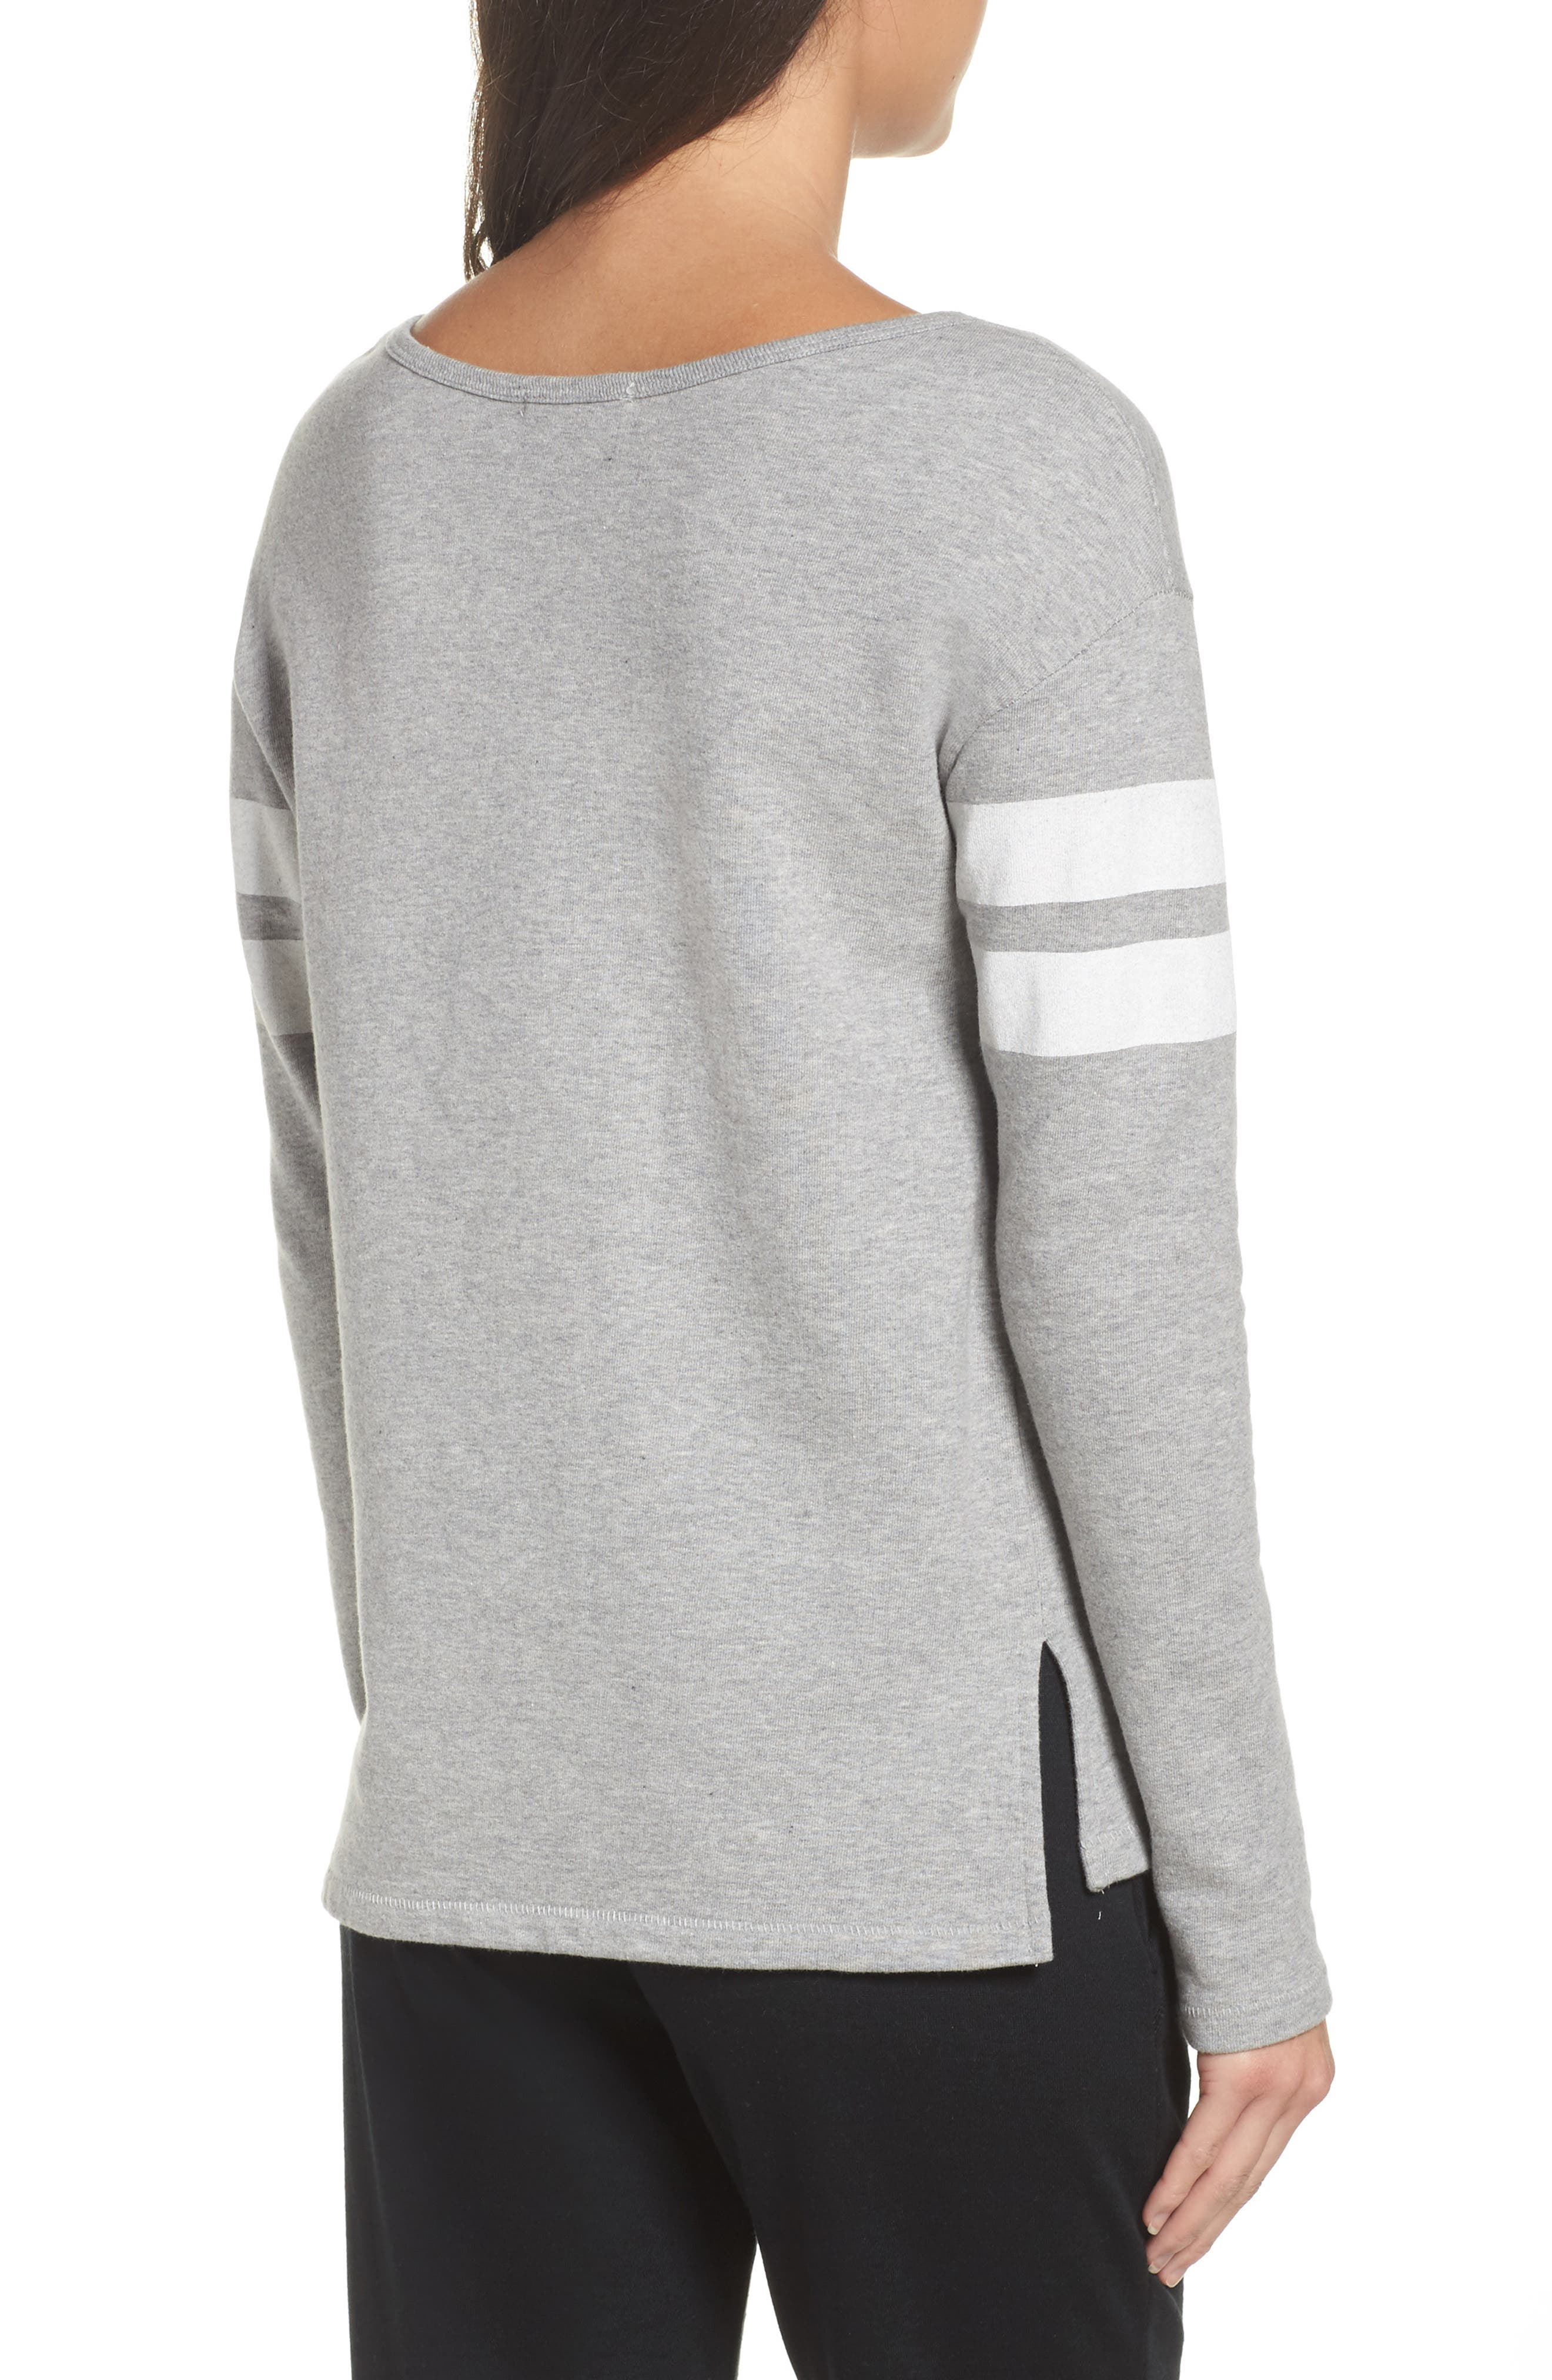 NFL San Francisco 49ers Champion Sweatshirt,                             Alternate thumbnail 2, color,